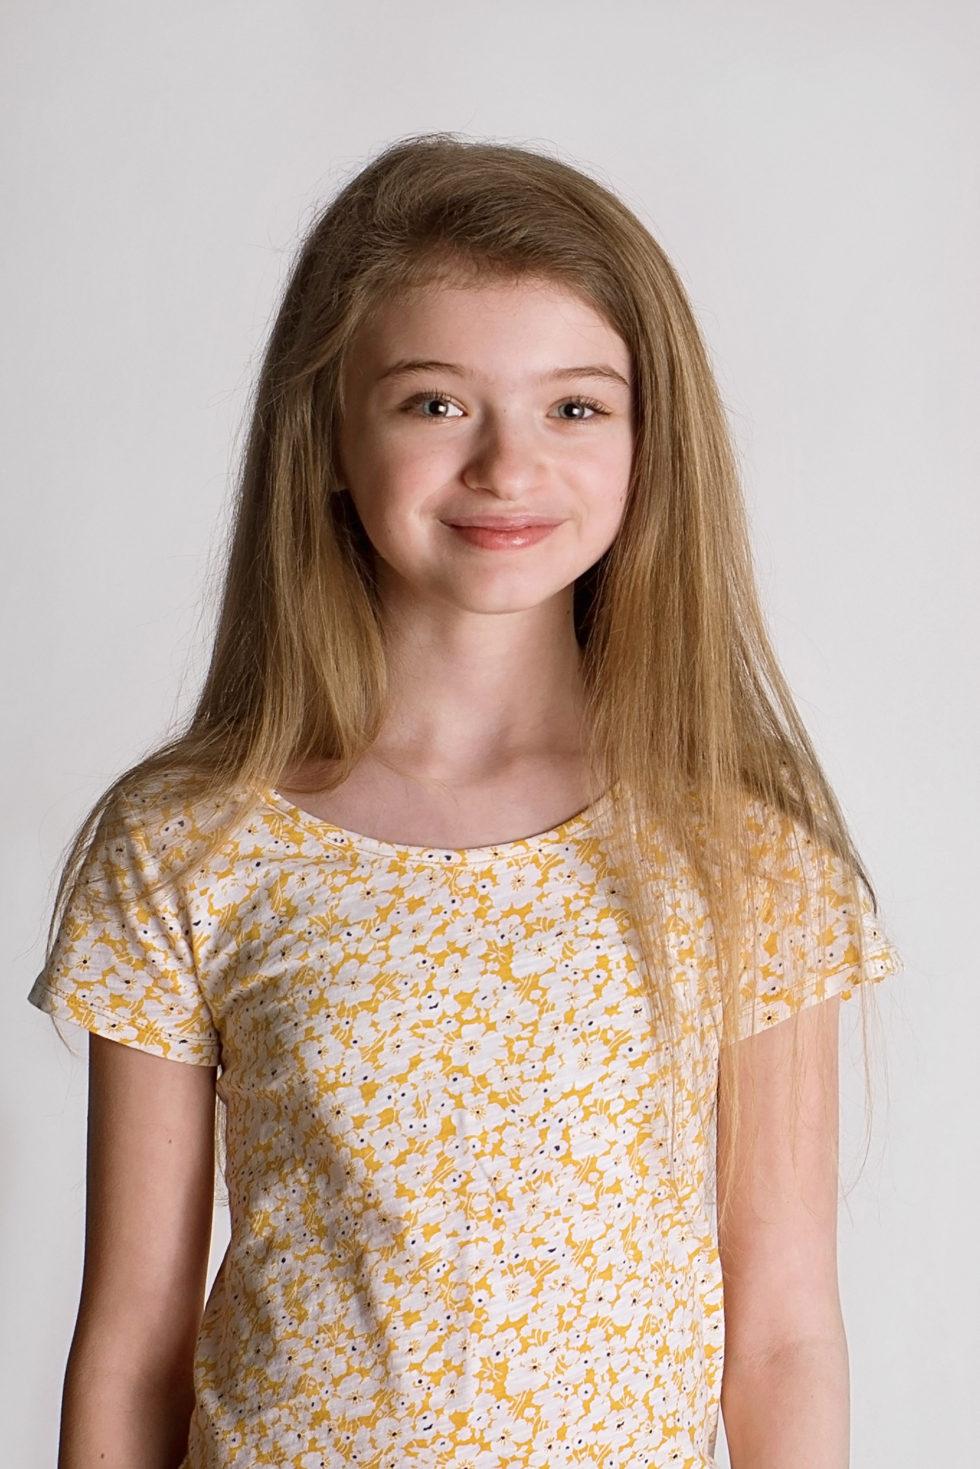 Child Modelling Headshots & Portfolio Updates ~ Mira Photography